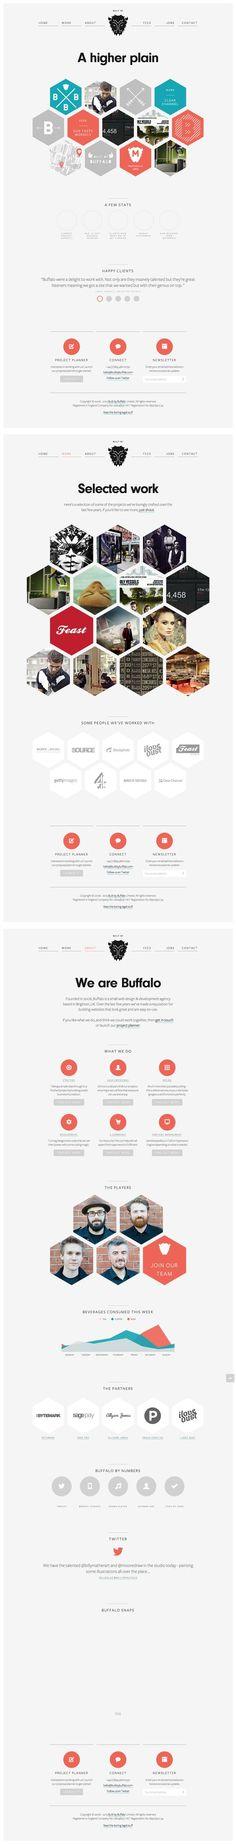 Build by Buffalo #flat #design #interface